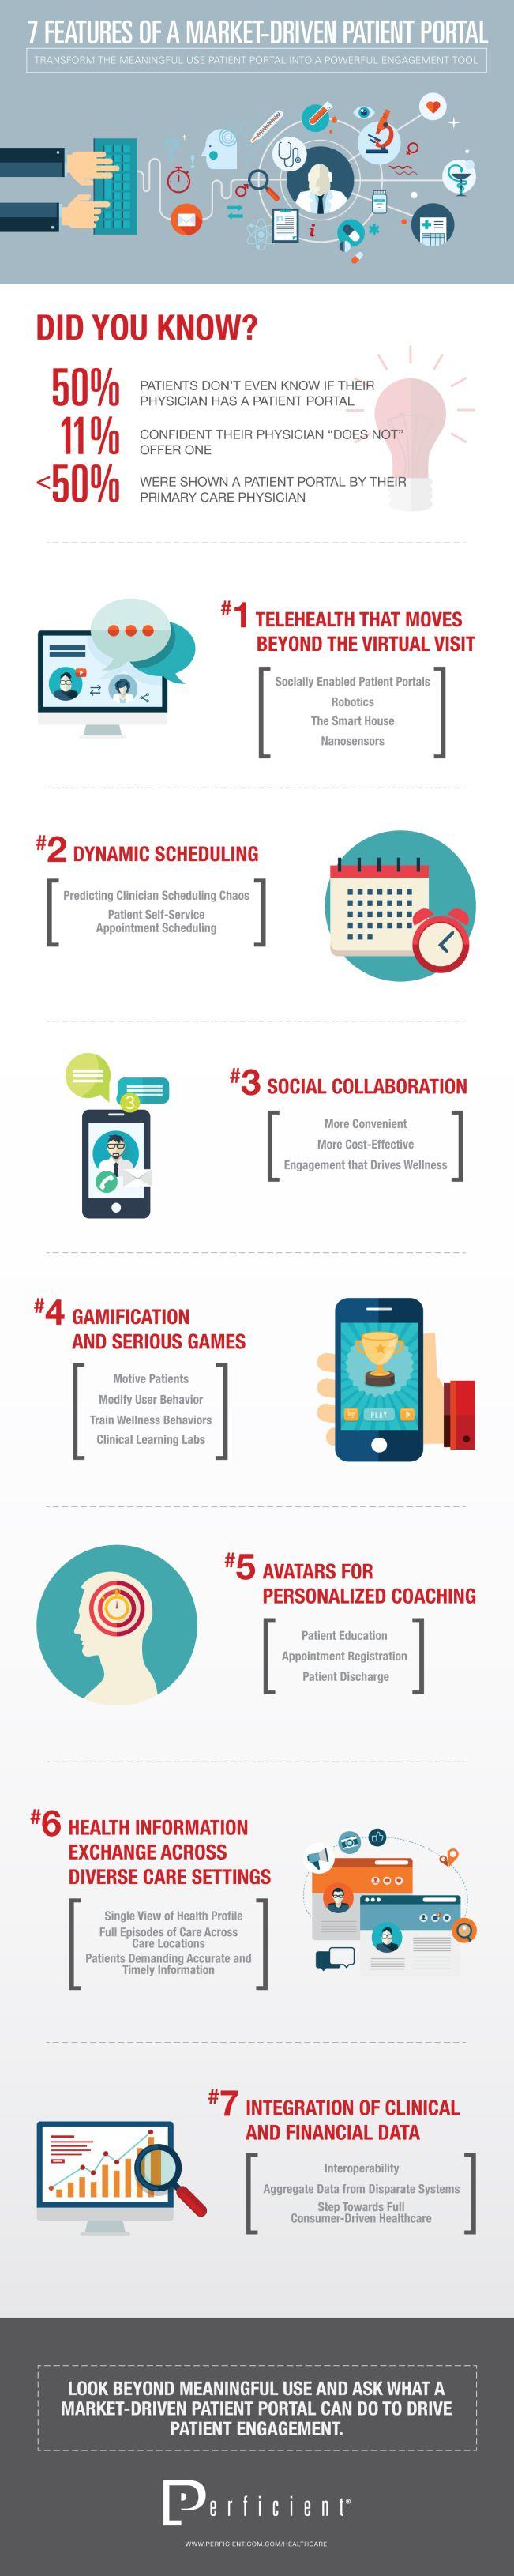 7 Features of a Market-Driven Patient Portal Infographic